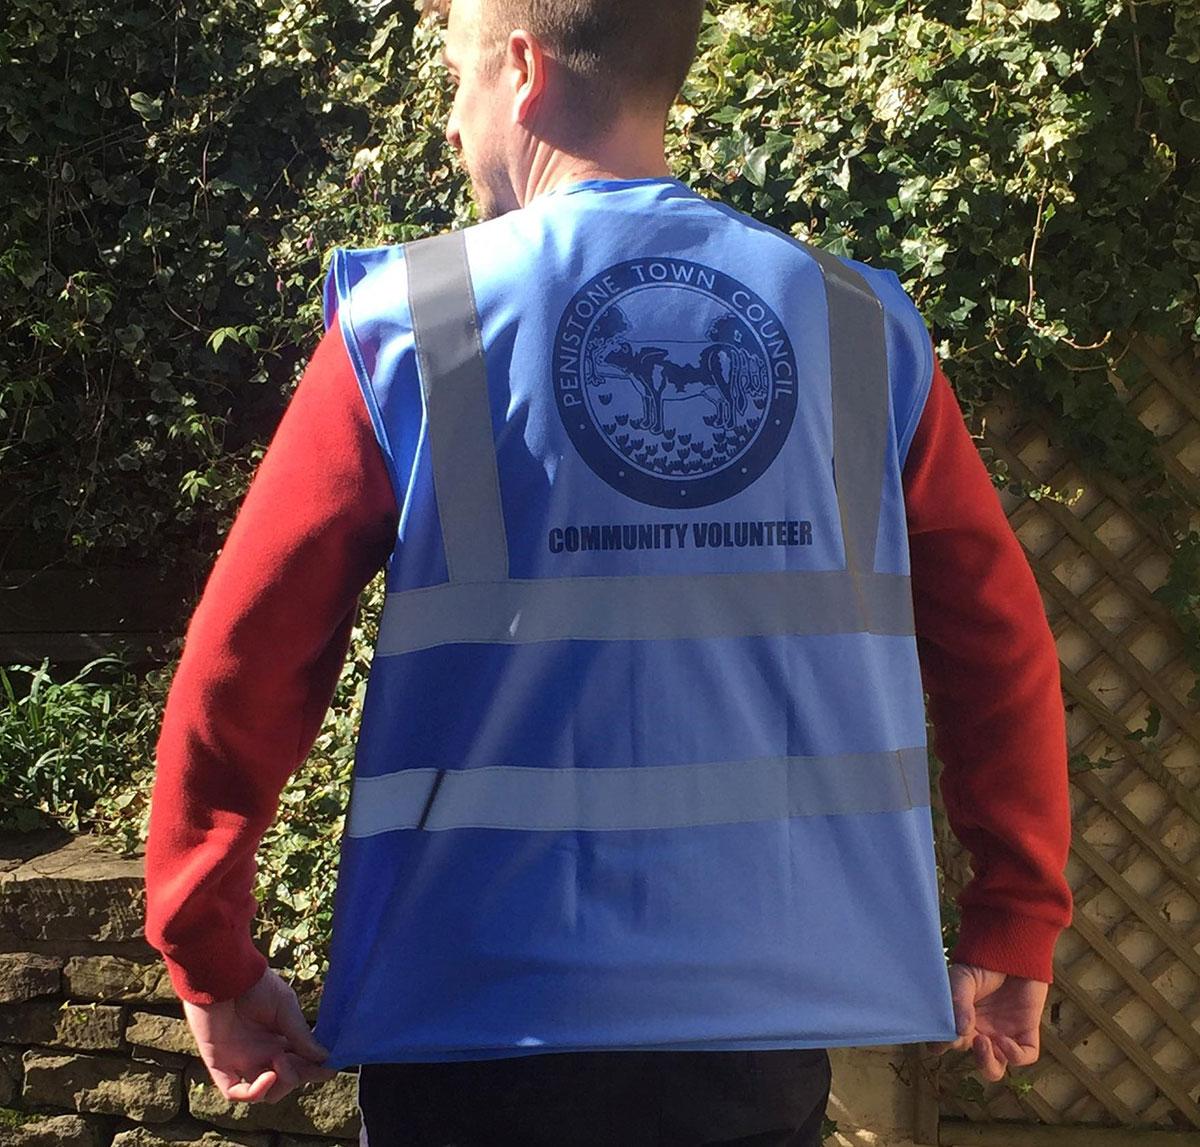 Image of vest to be worn by volunteers